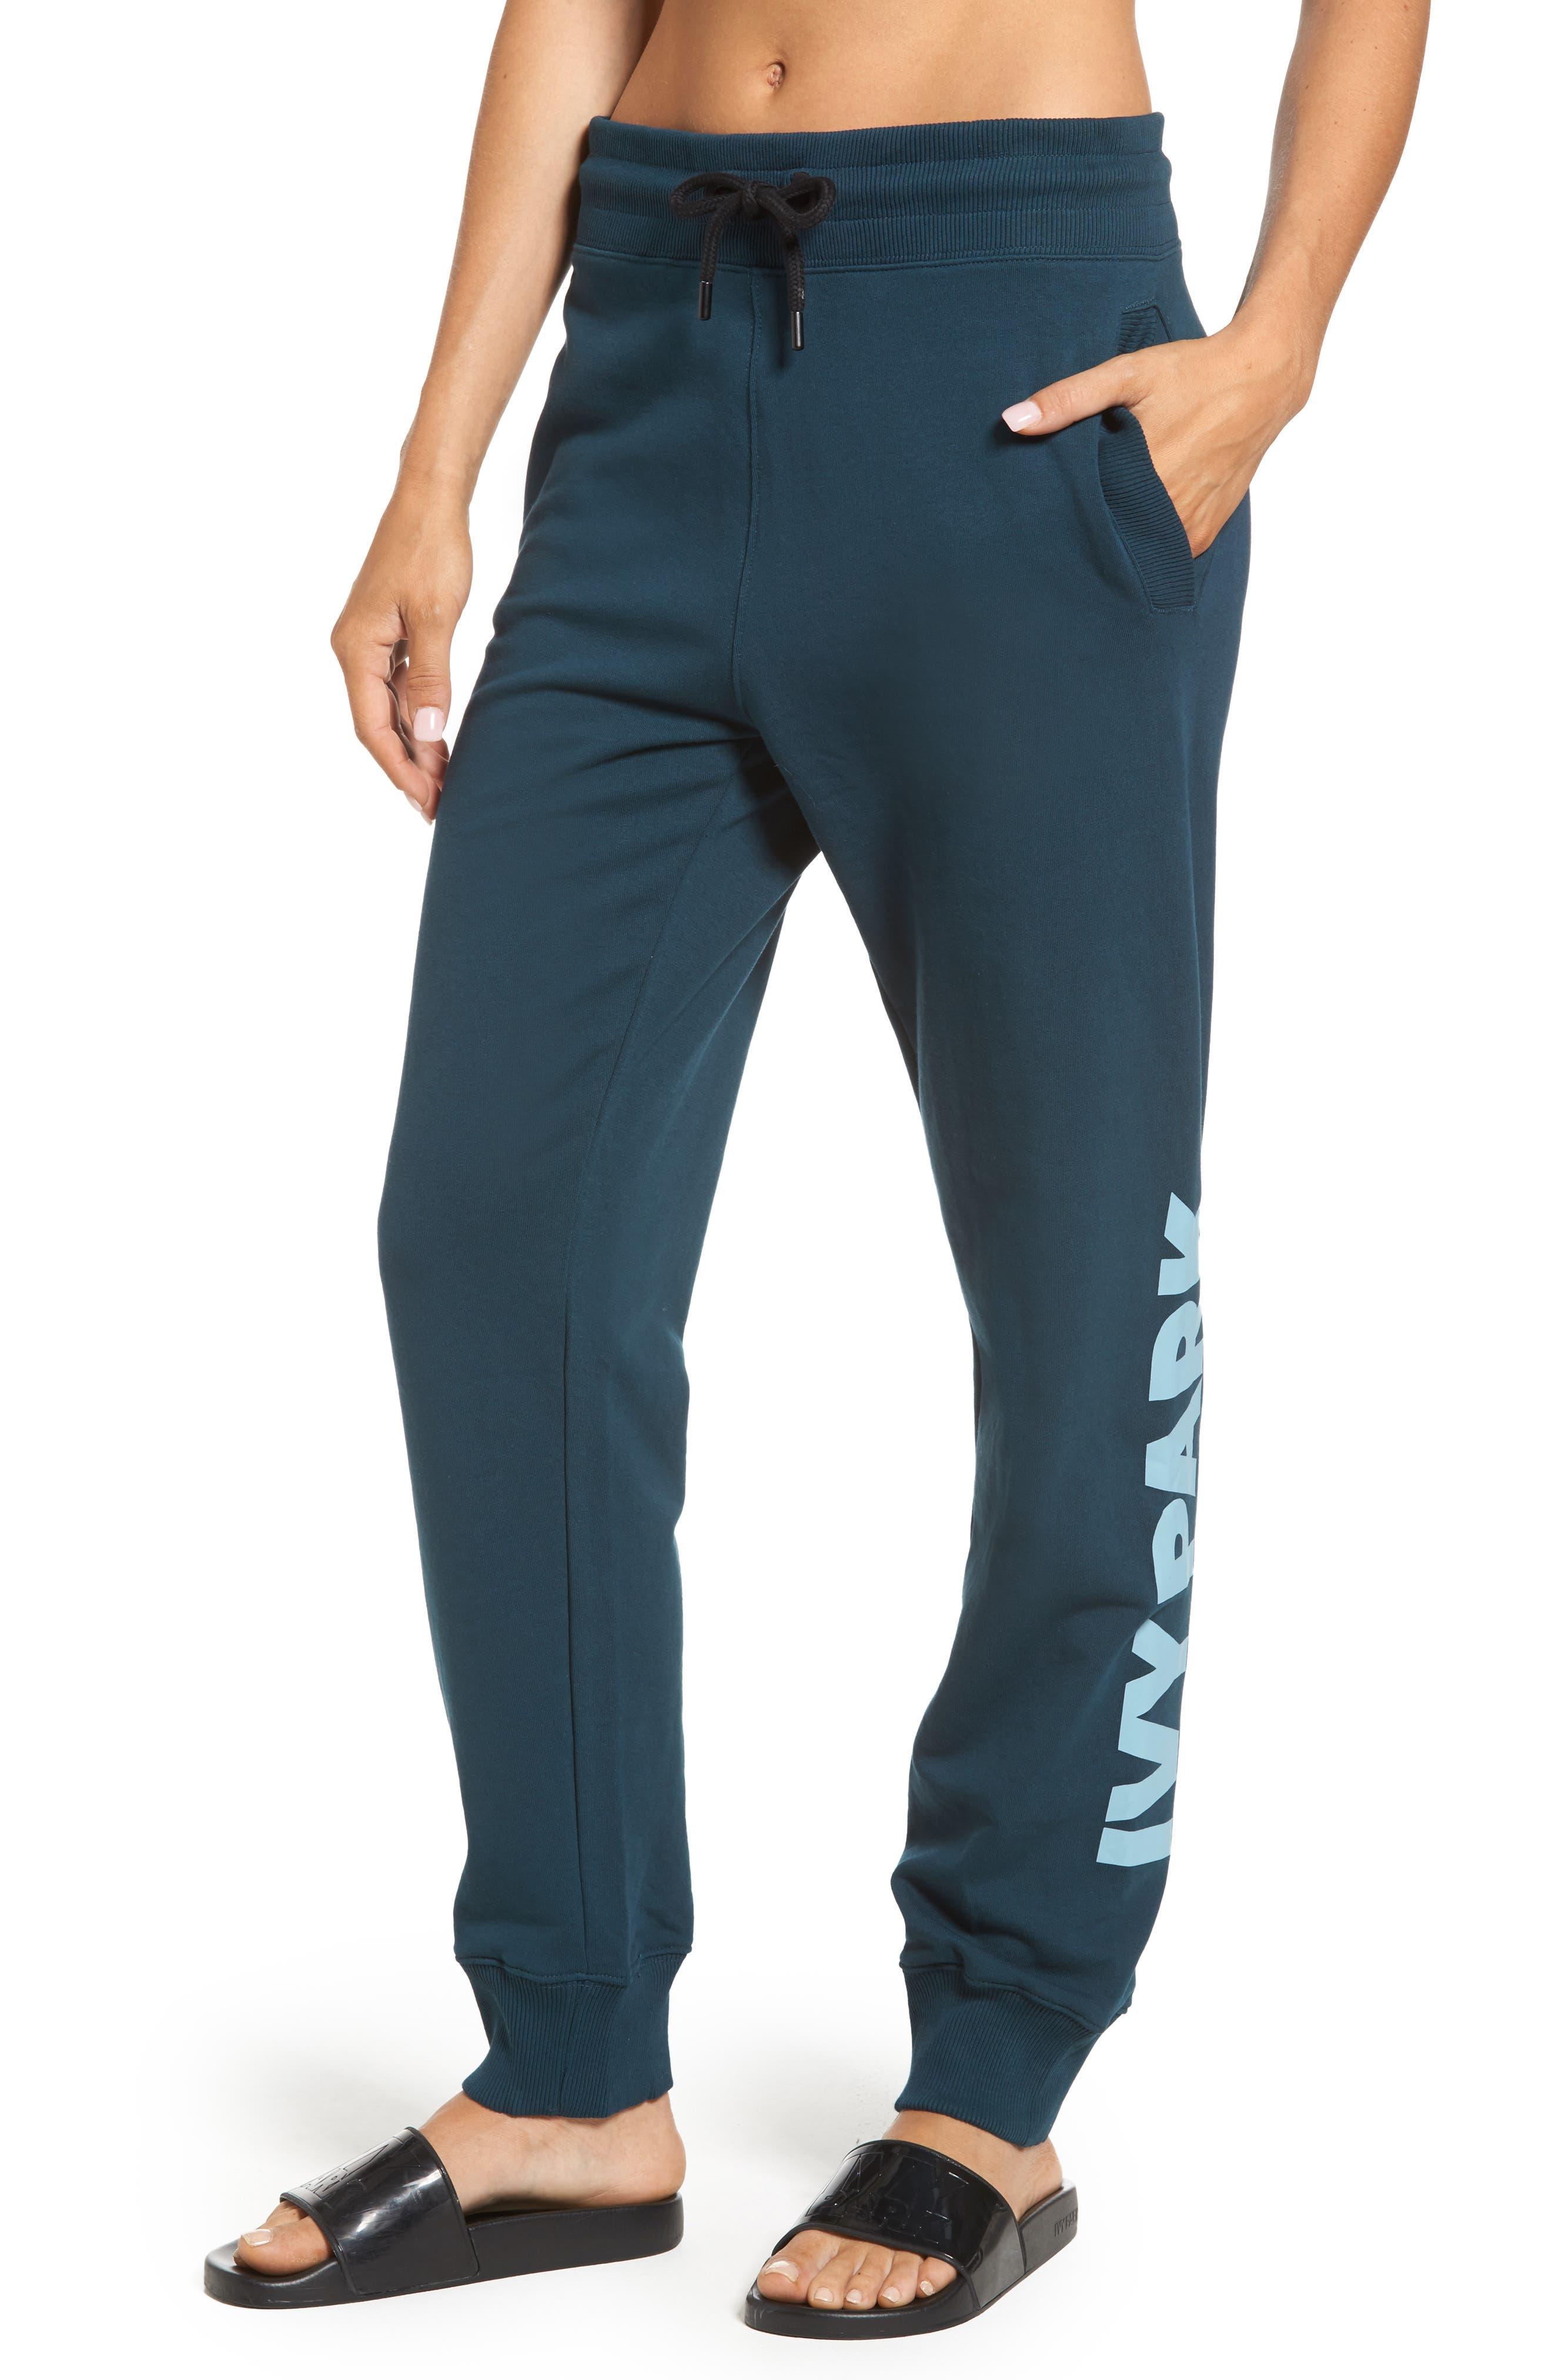 Alternate Image 1 Selected - IVY PARK® Logo Jogger Pants